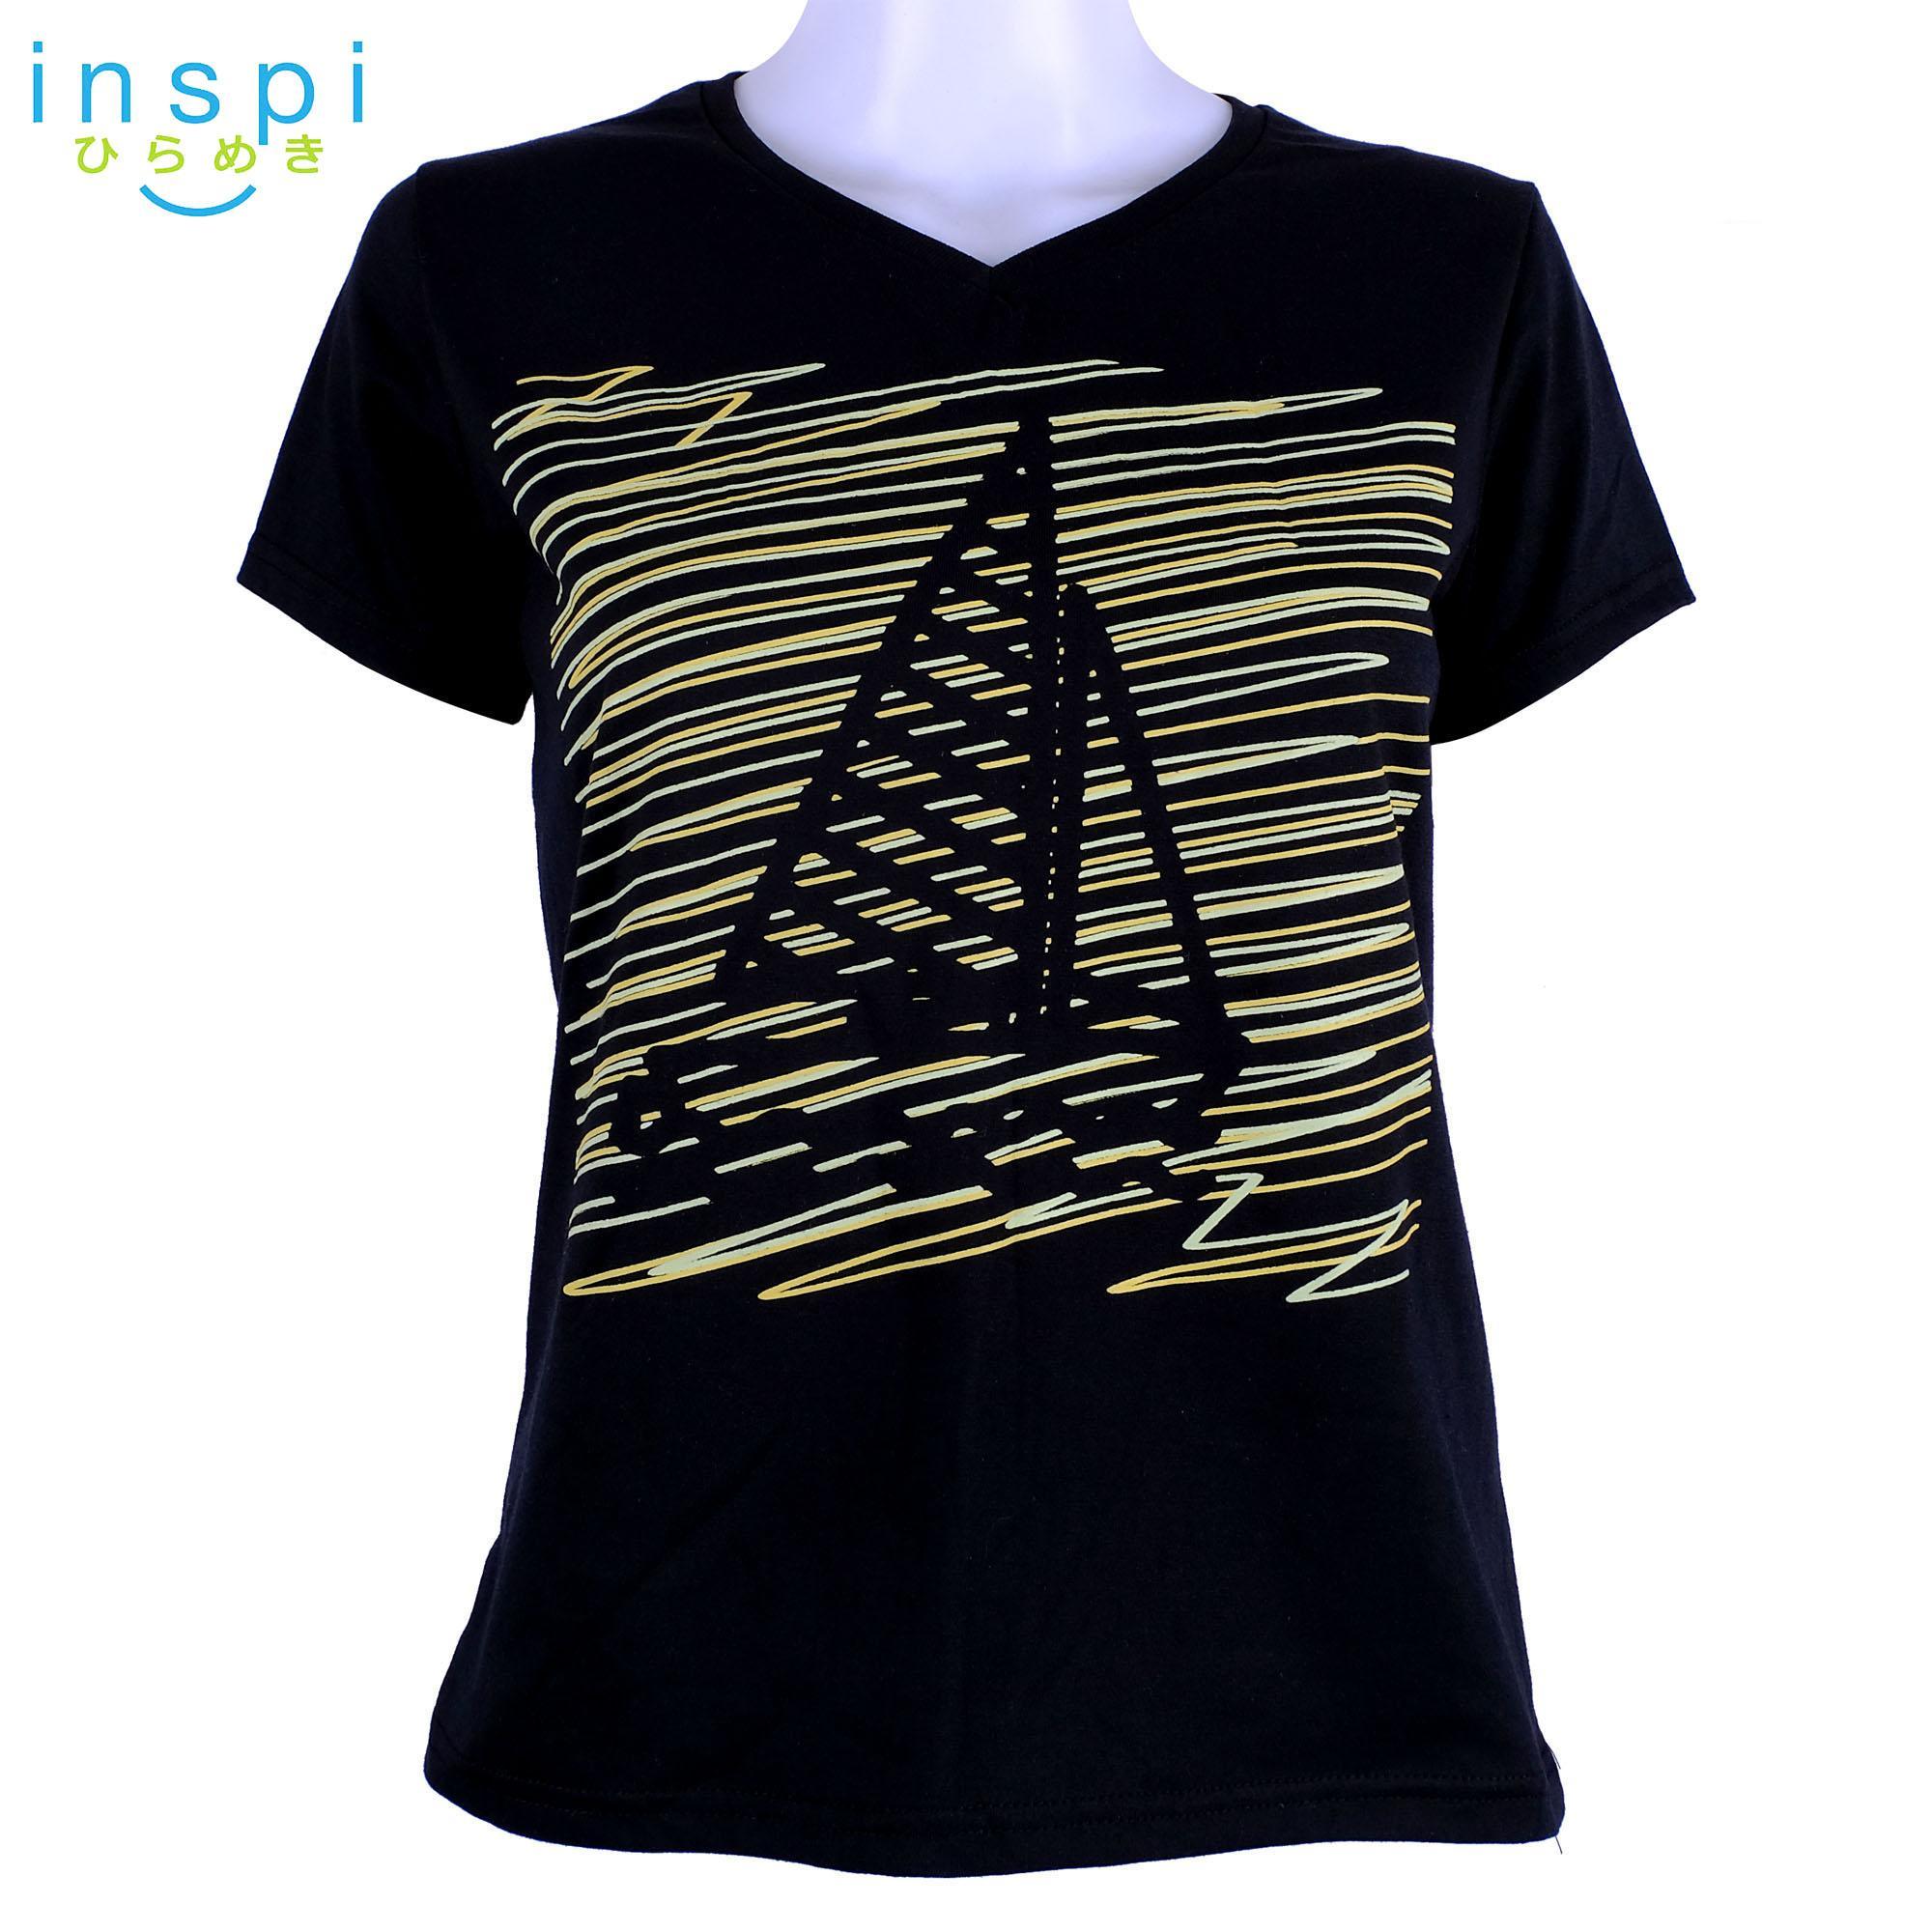 8690bf53ed270 INSPI Tees Ladies Semi Fit Doodle Boat (Black) tshirt printed graphic tee t  shirt